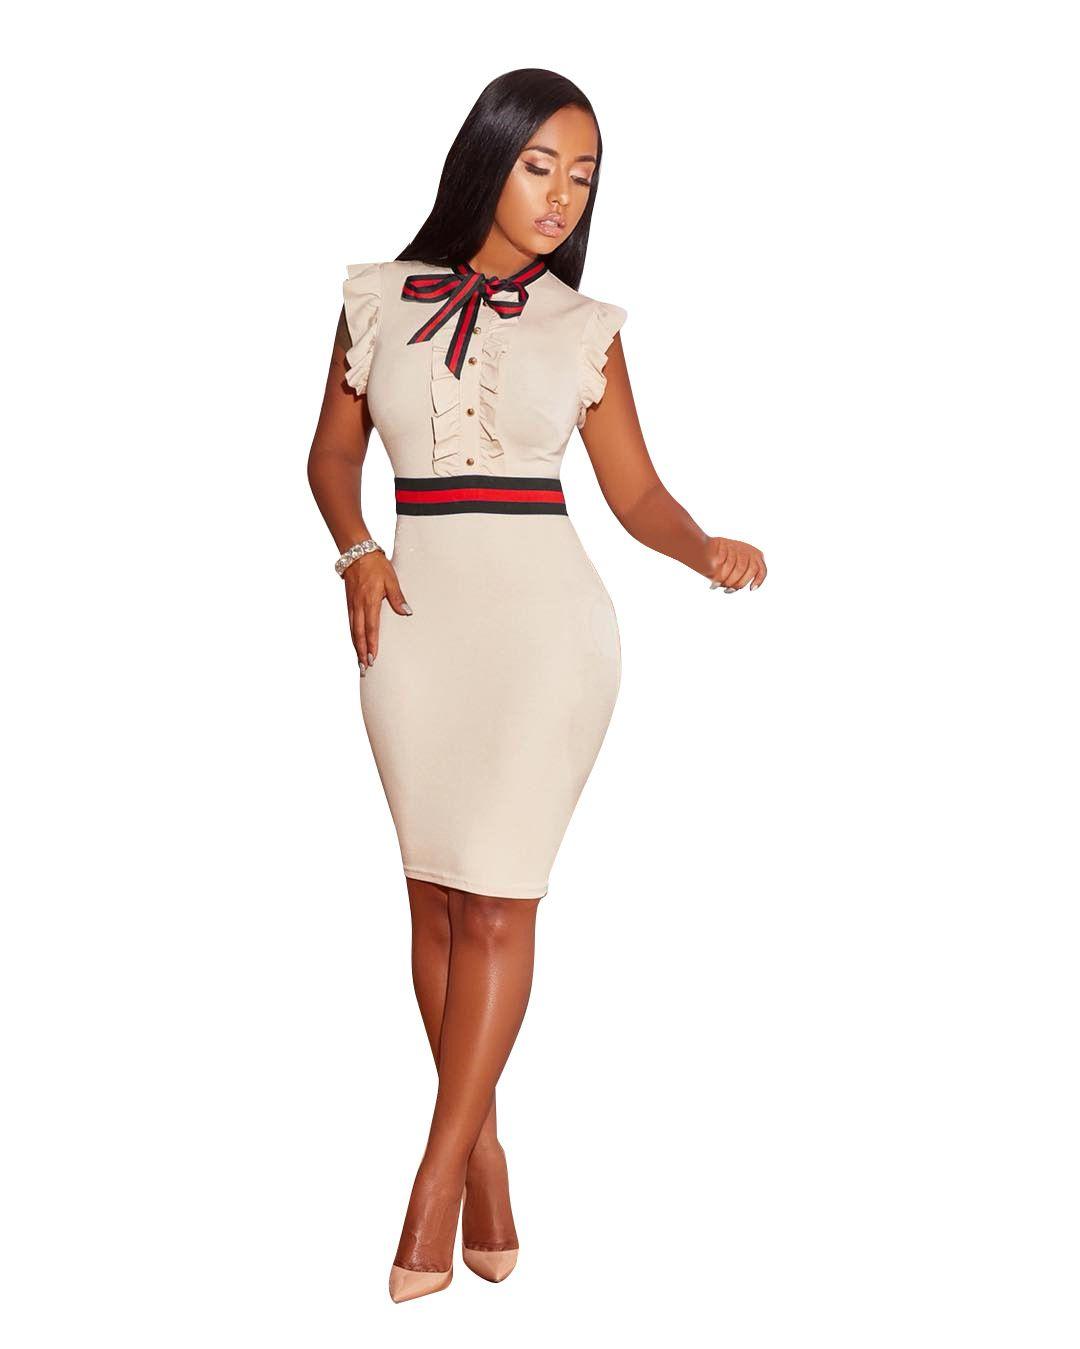 583cc245278e6 2018 2018 Women'S Dress Bow Sexy Dress Spring Summer Short Sleeved Ladies'  Dress New Patchwork Work Office Dresses S 3xl From Hengda999, $11.06 | ...